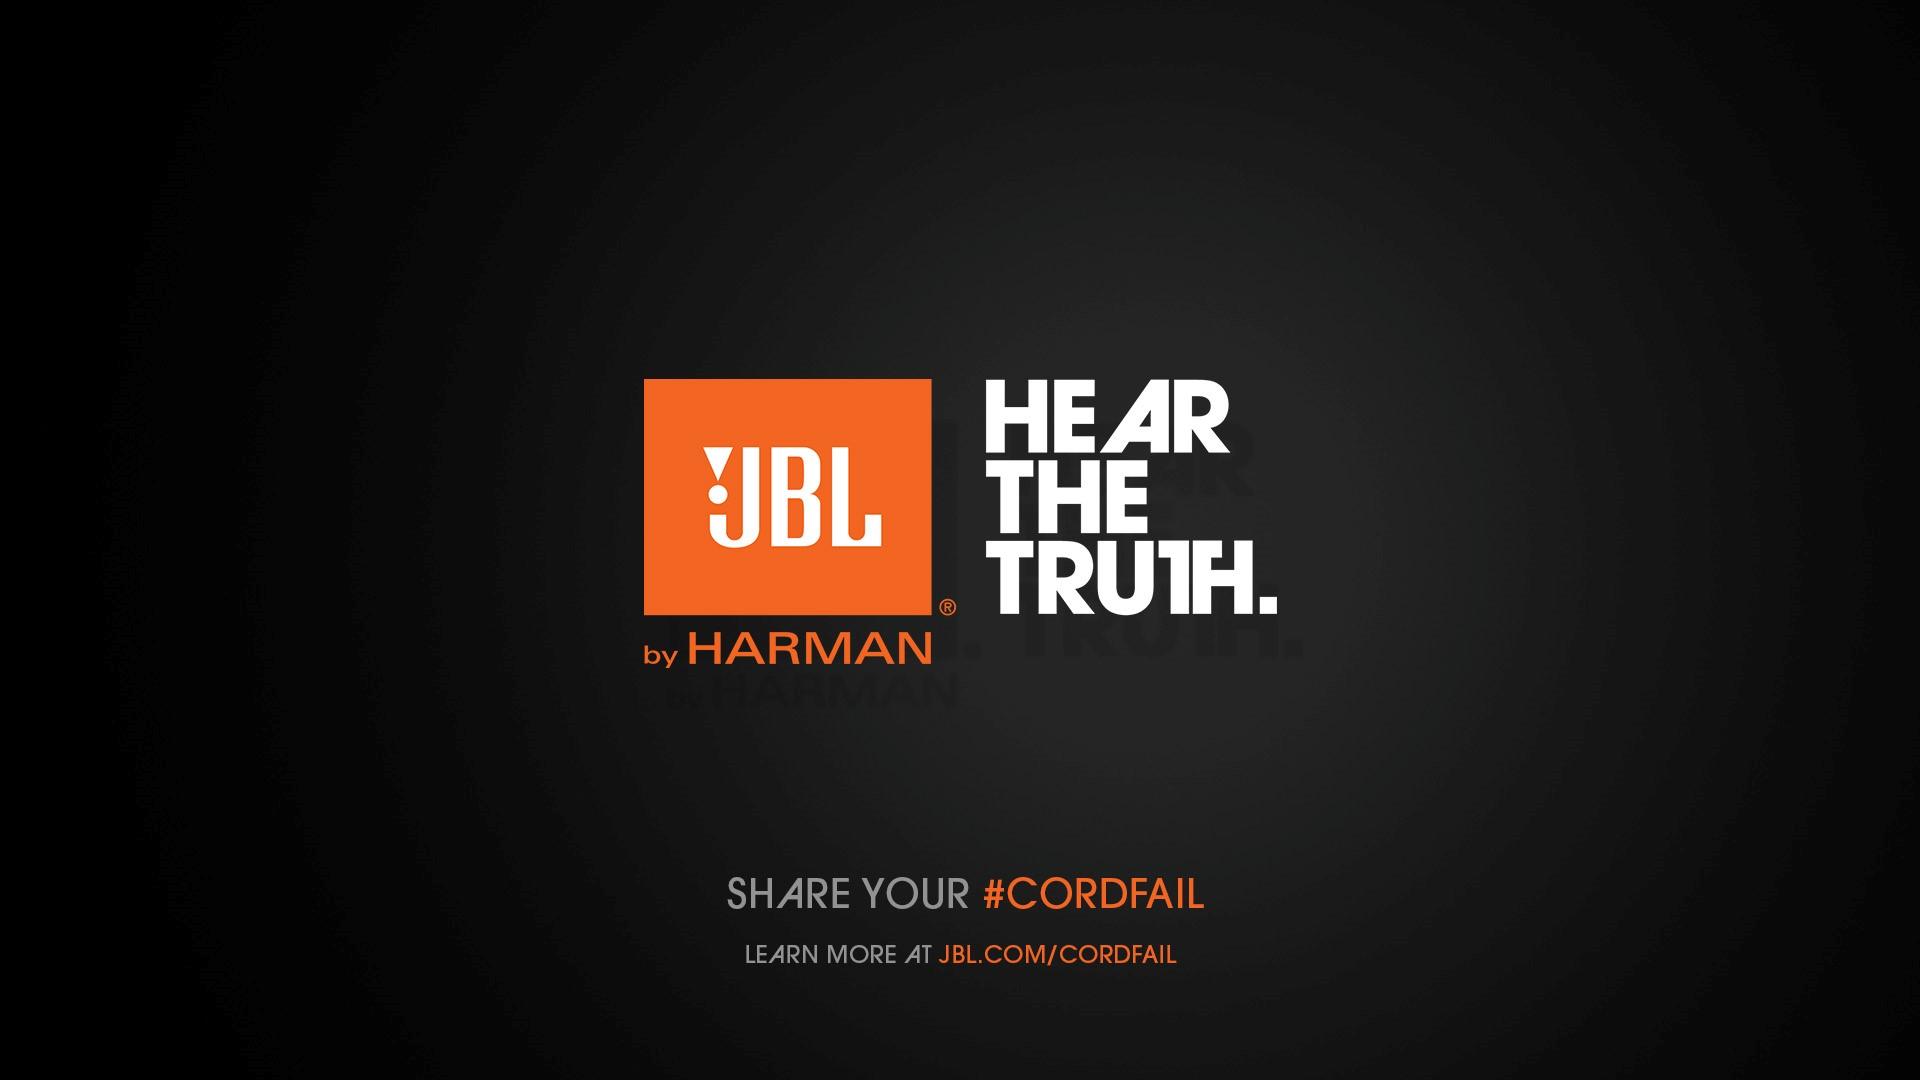 jbl logo. an error occurred. jbl logo